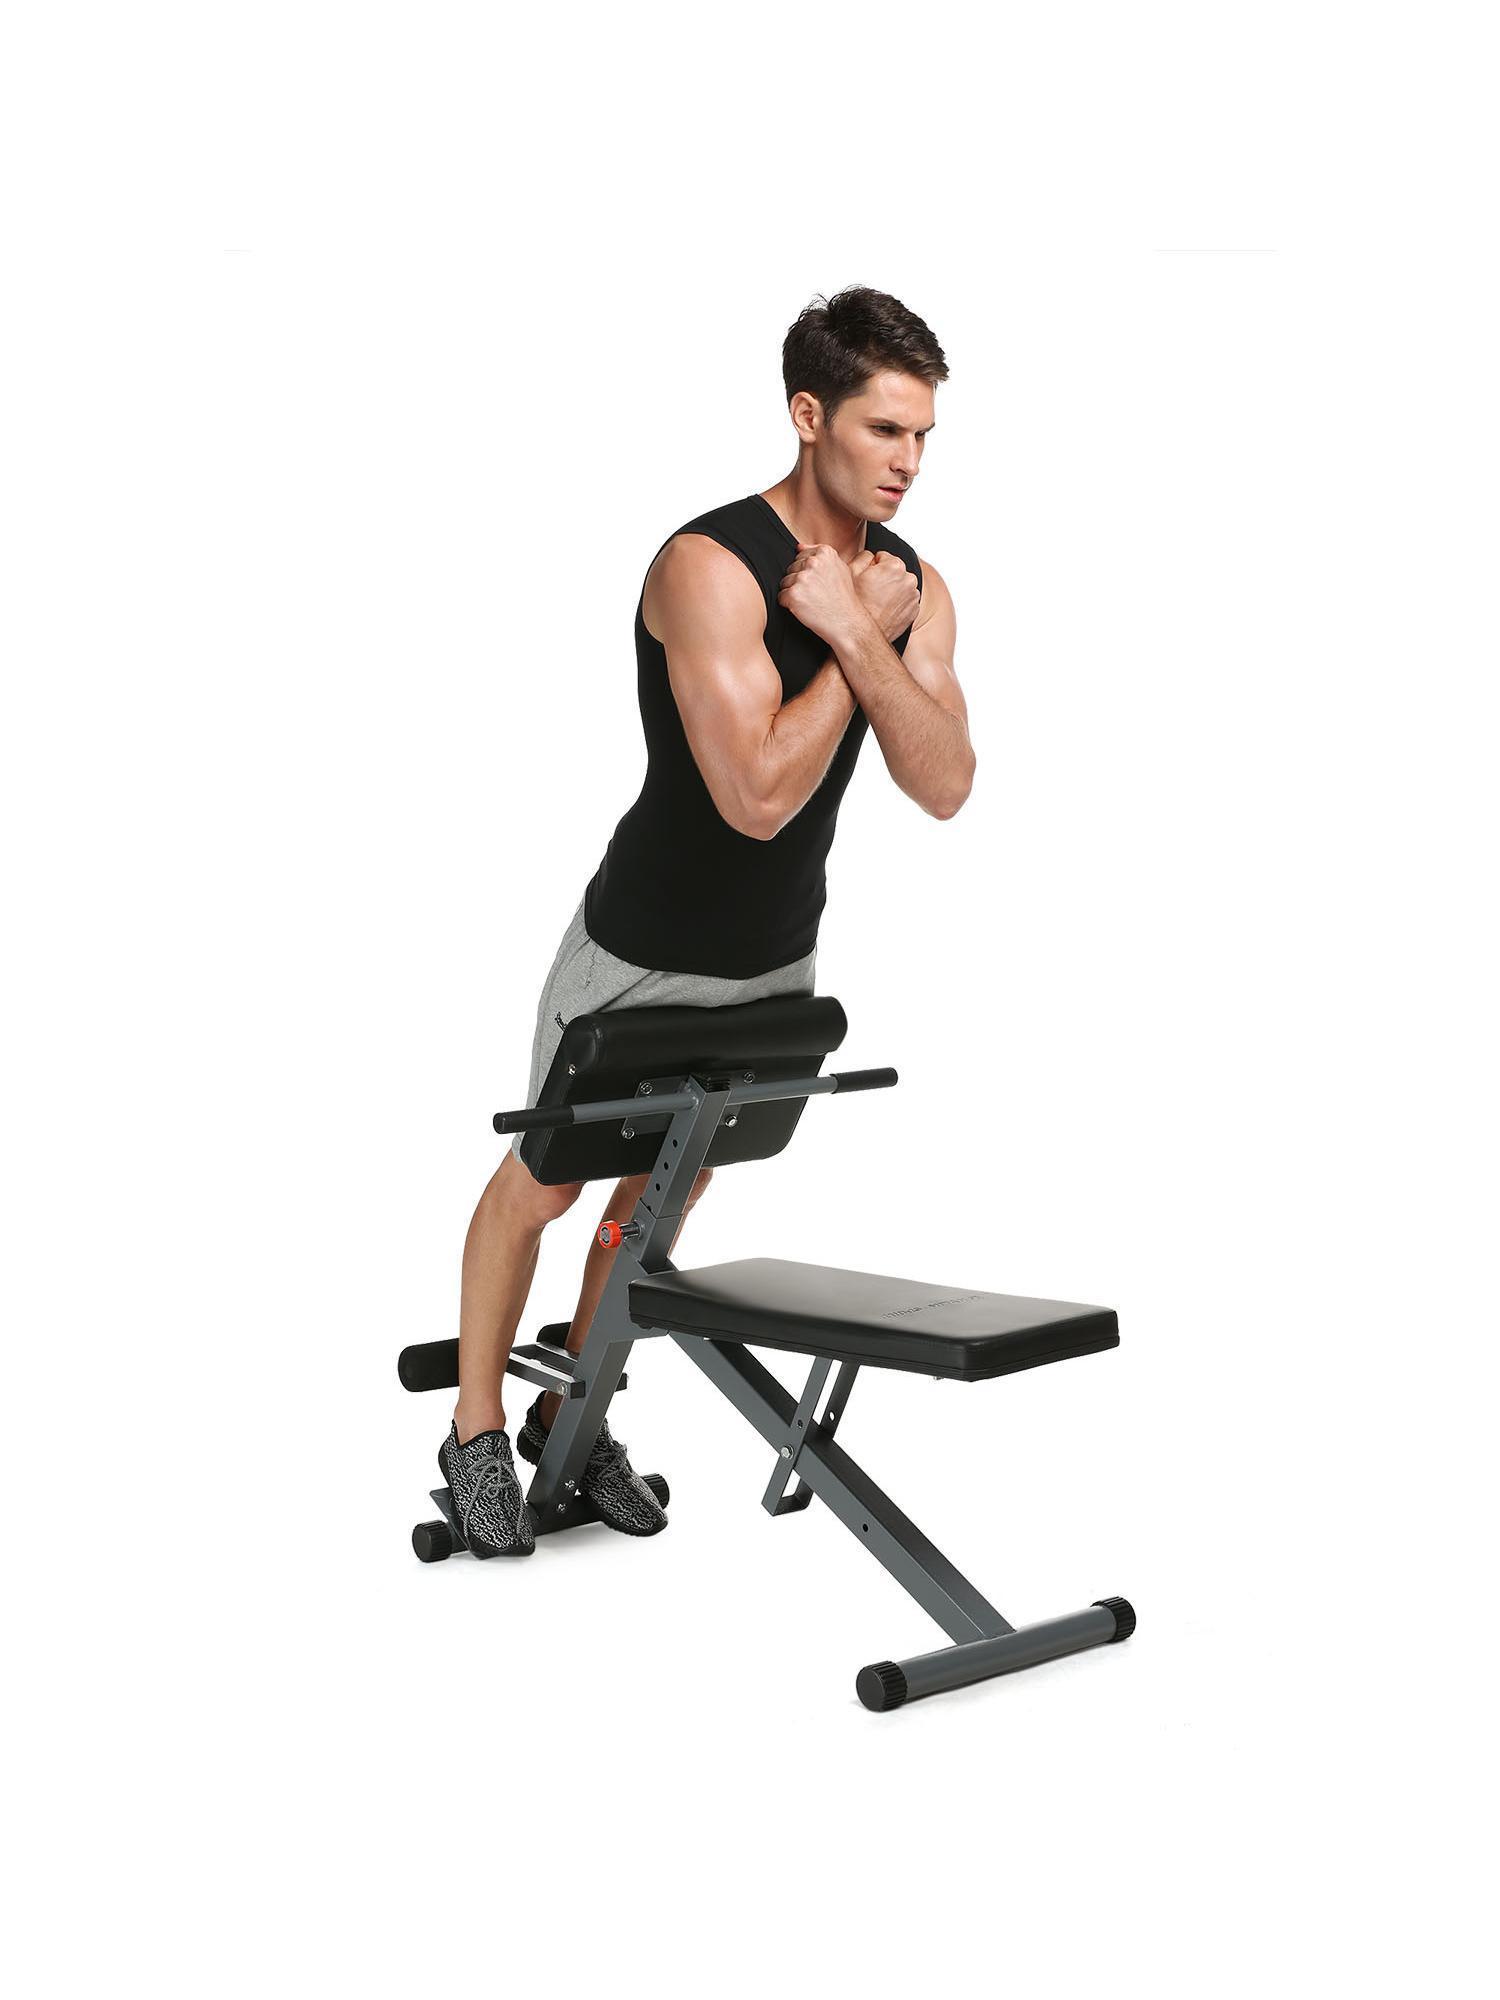 Adjustable Sit Up Bench Slant Board Ab Trainer Exercise